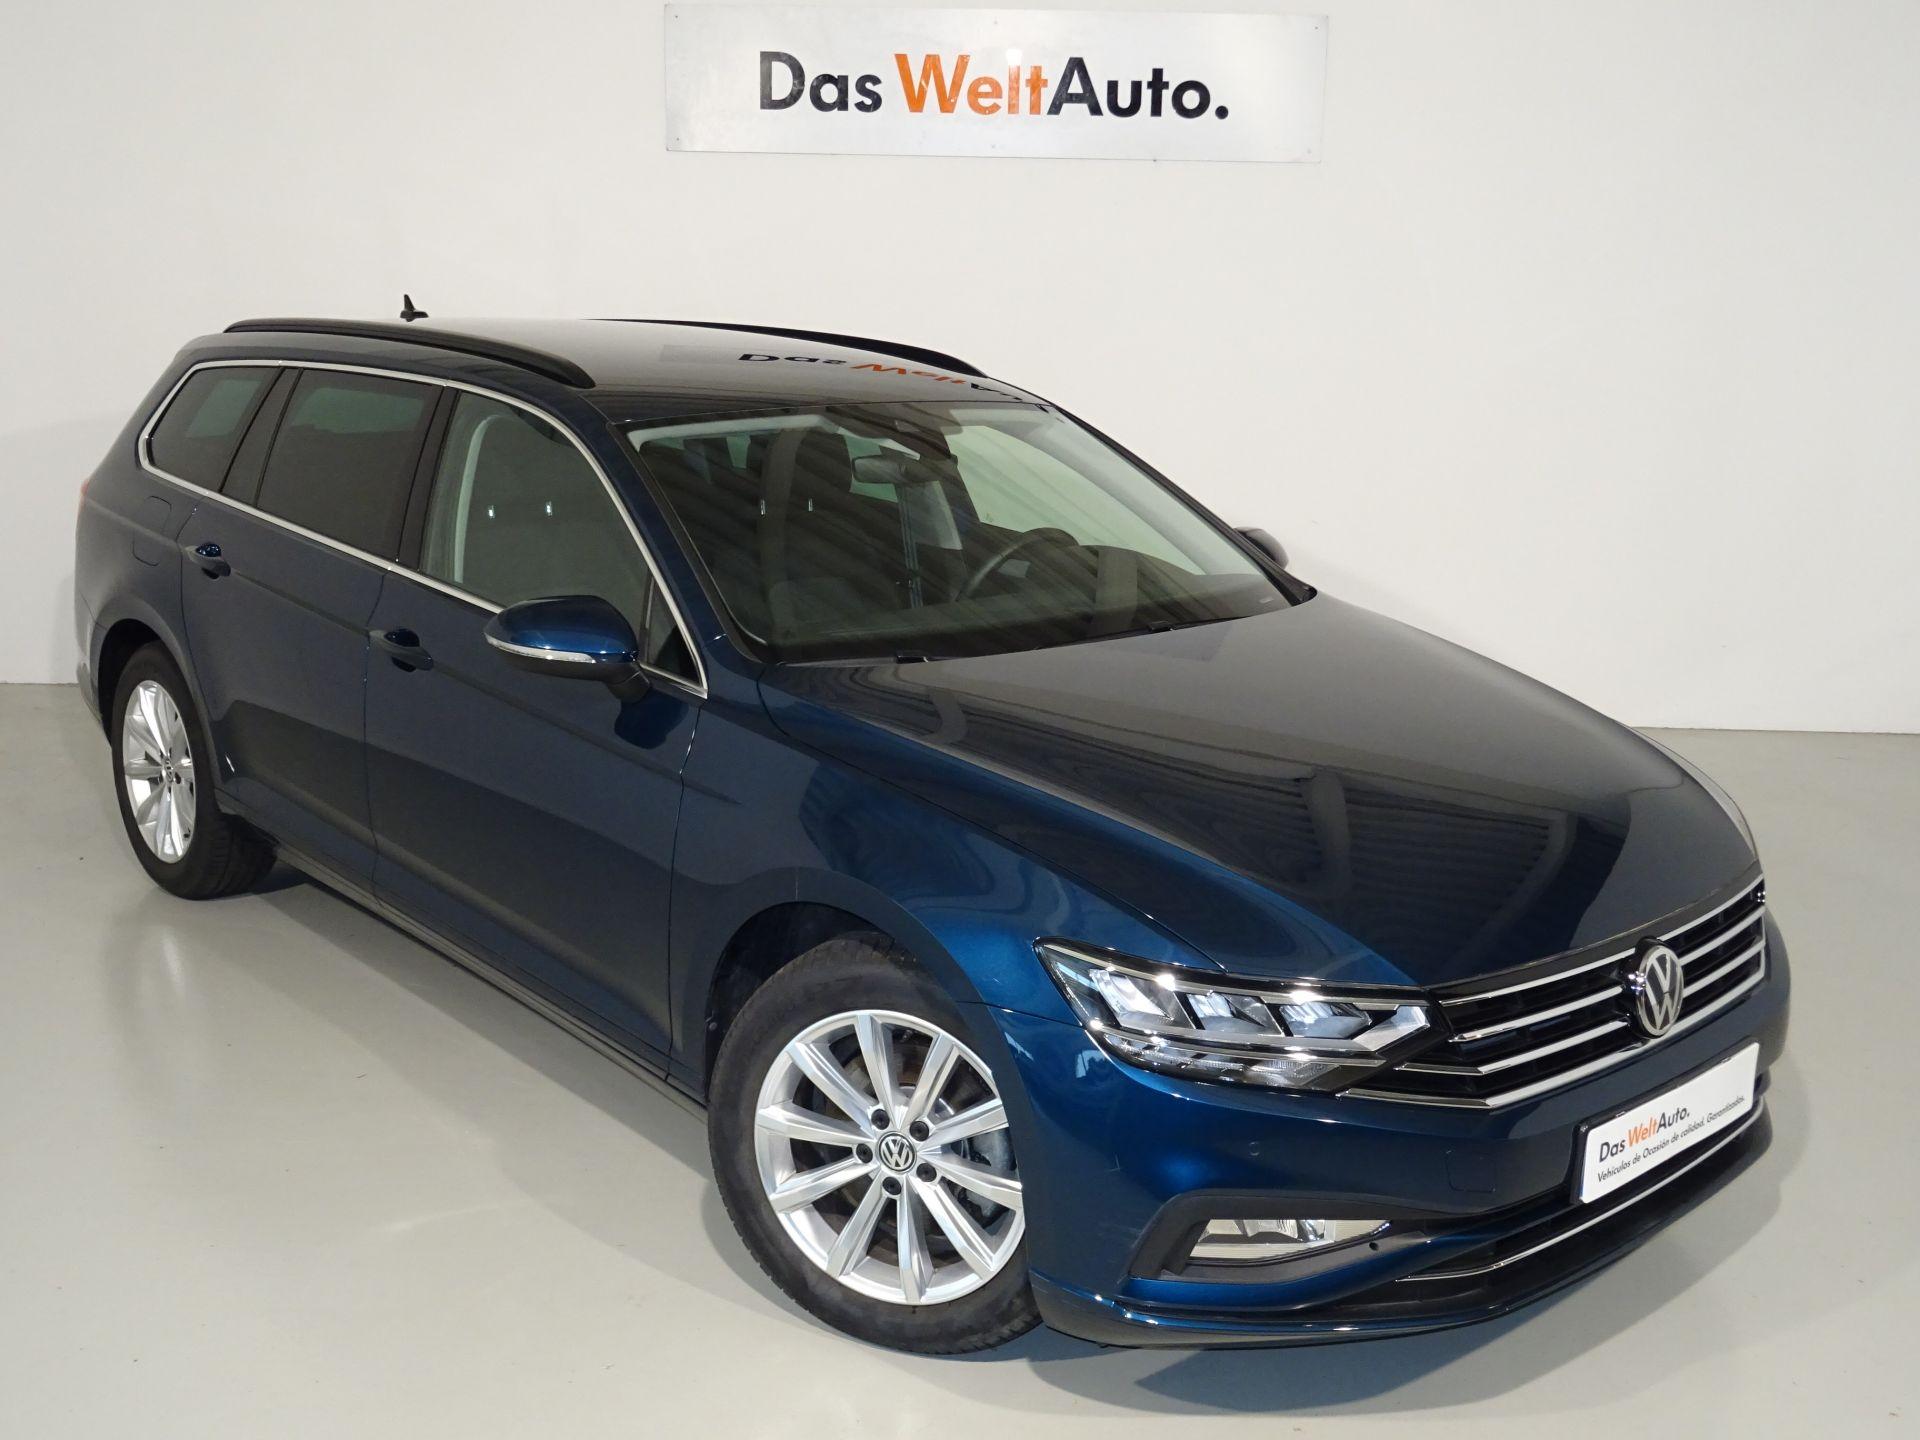 Volkswagen Passat Variant Executive 1.5 TSI 110kW DSG